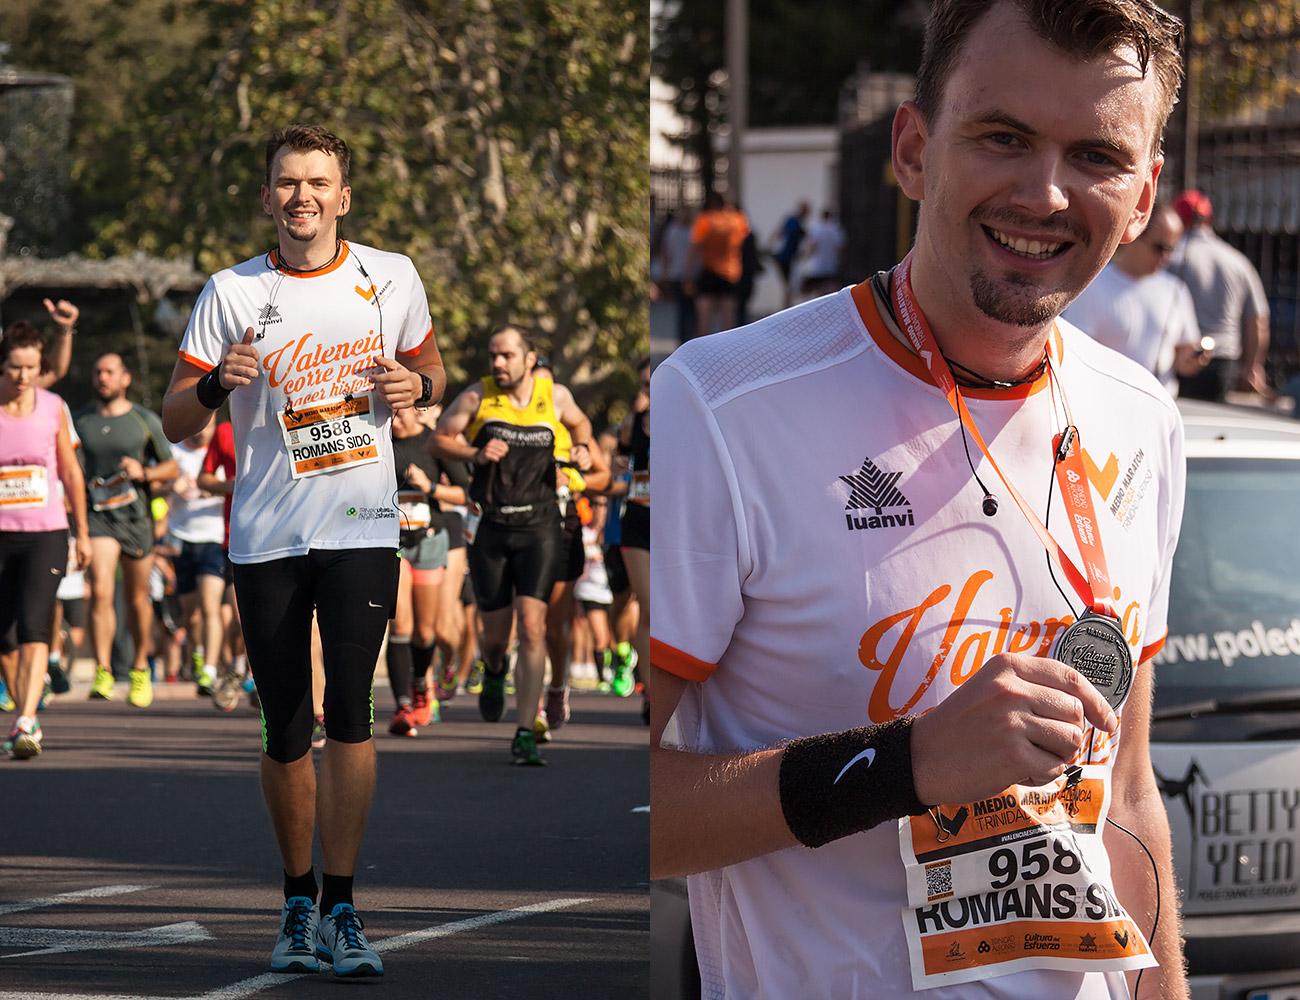 21l-vlc-half-marathon-16